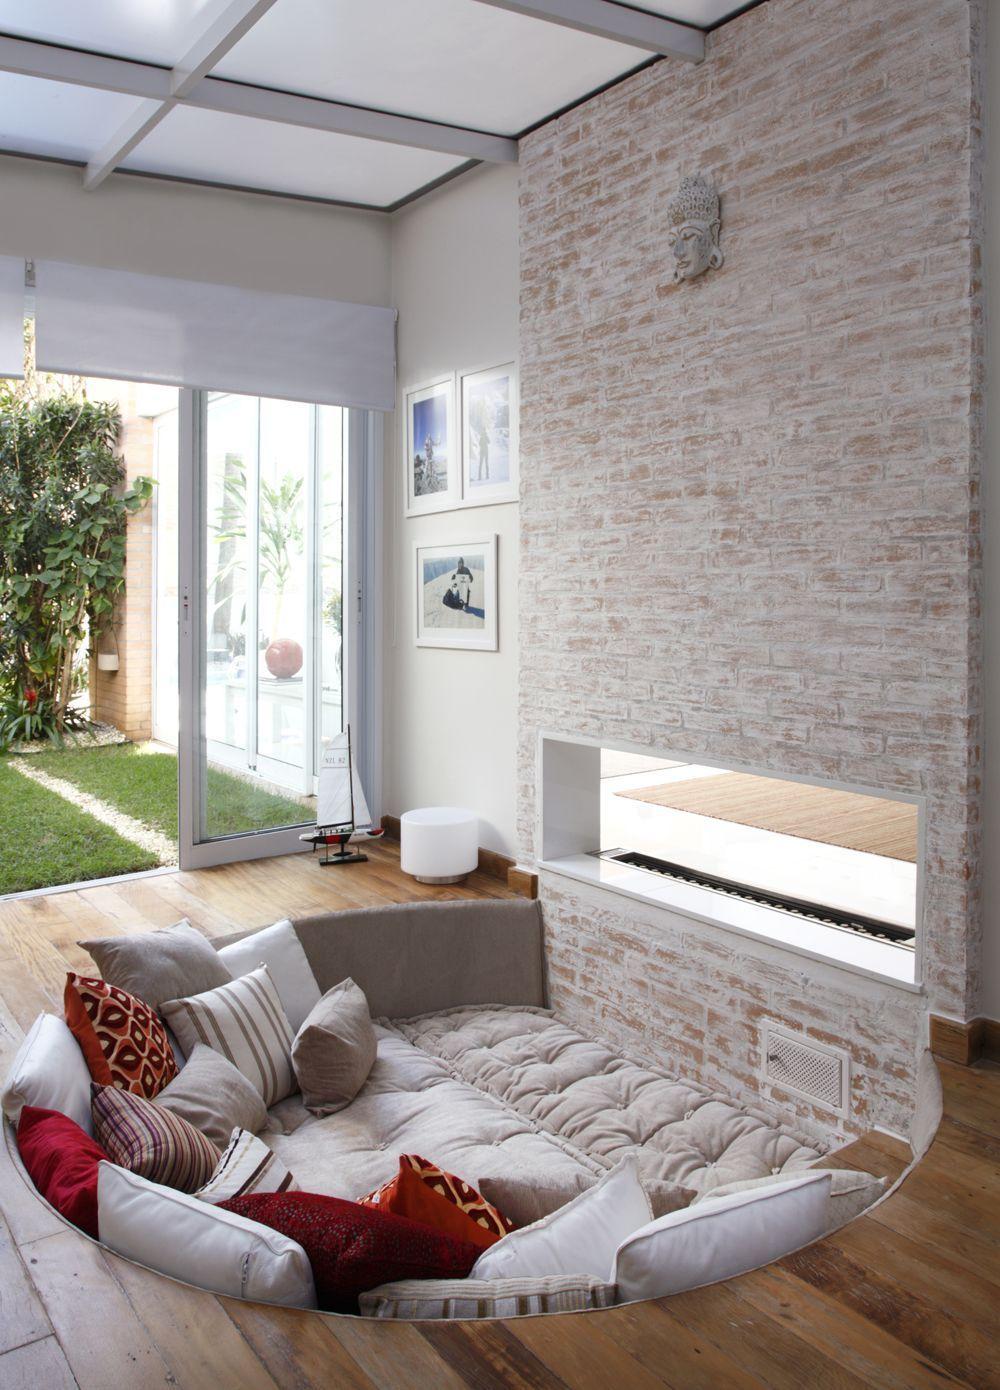 Quixotic gray living room #furnituremalang #LivingRoomFurnitureLuxury